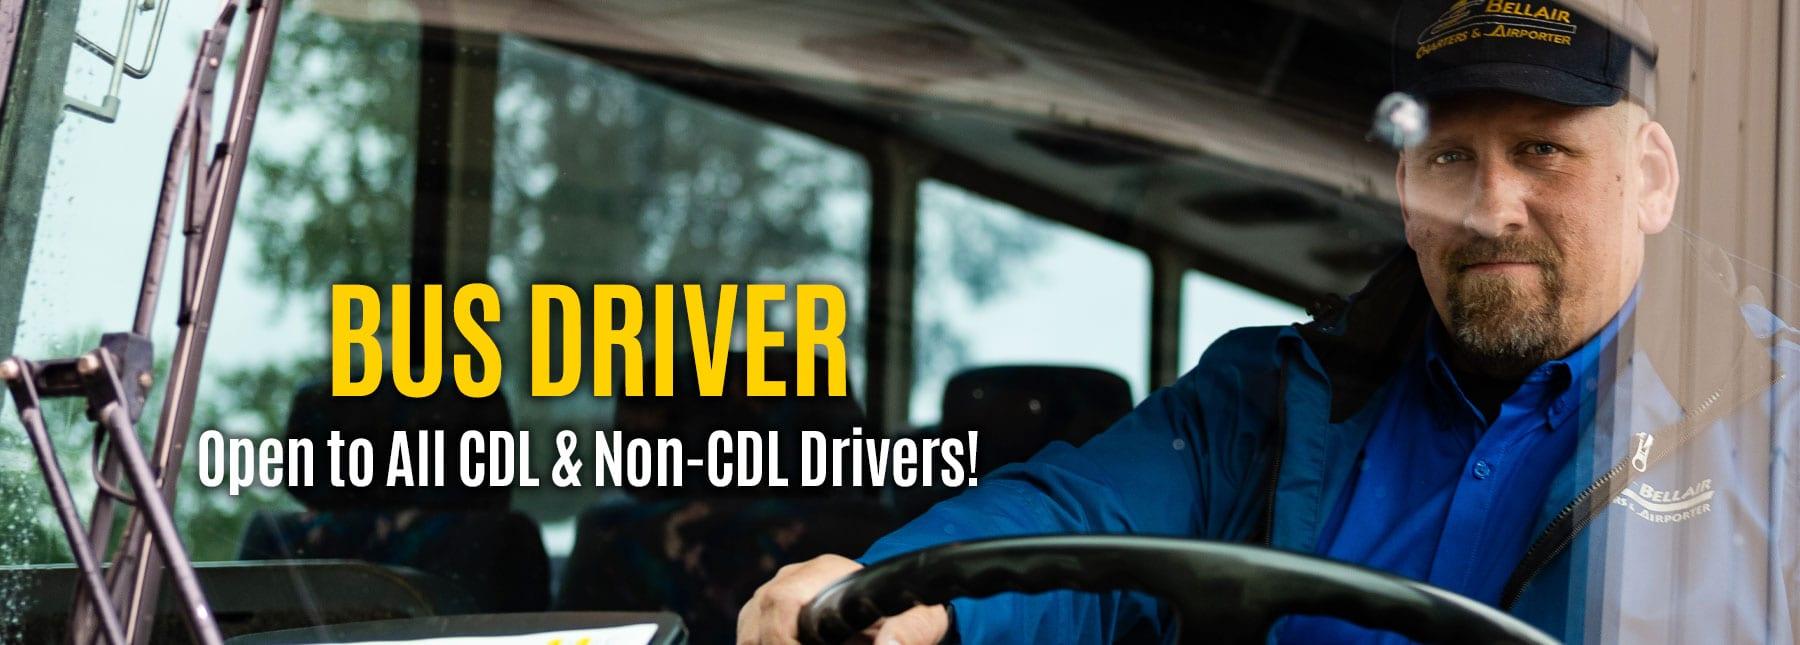 Bus Driver 2 20210706 1800x645